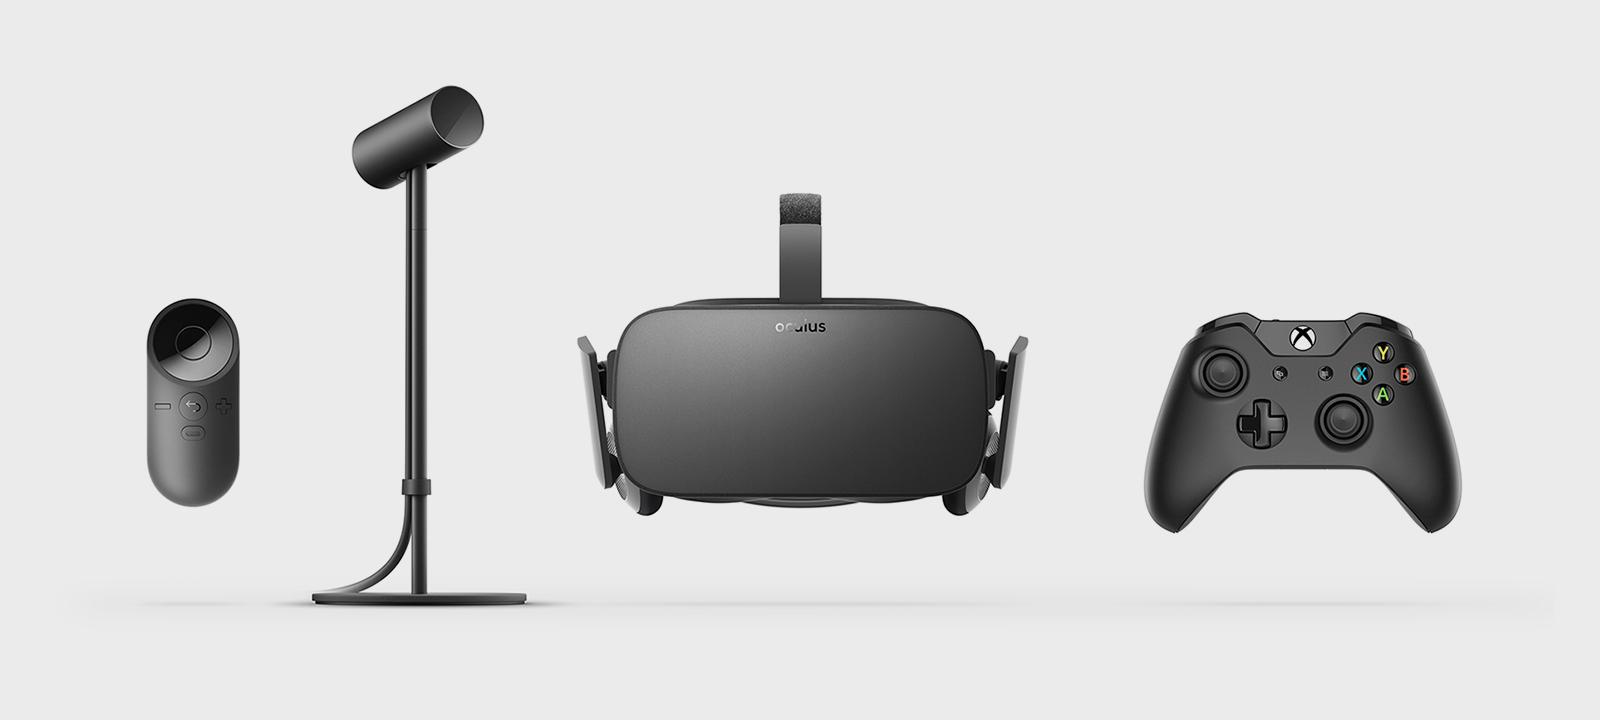 Oculus Rift, Oculus, virtual reality